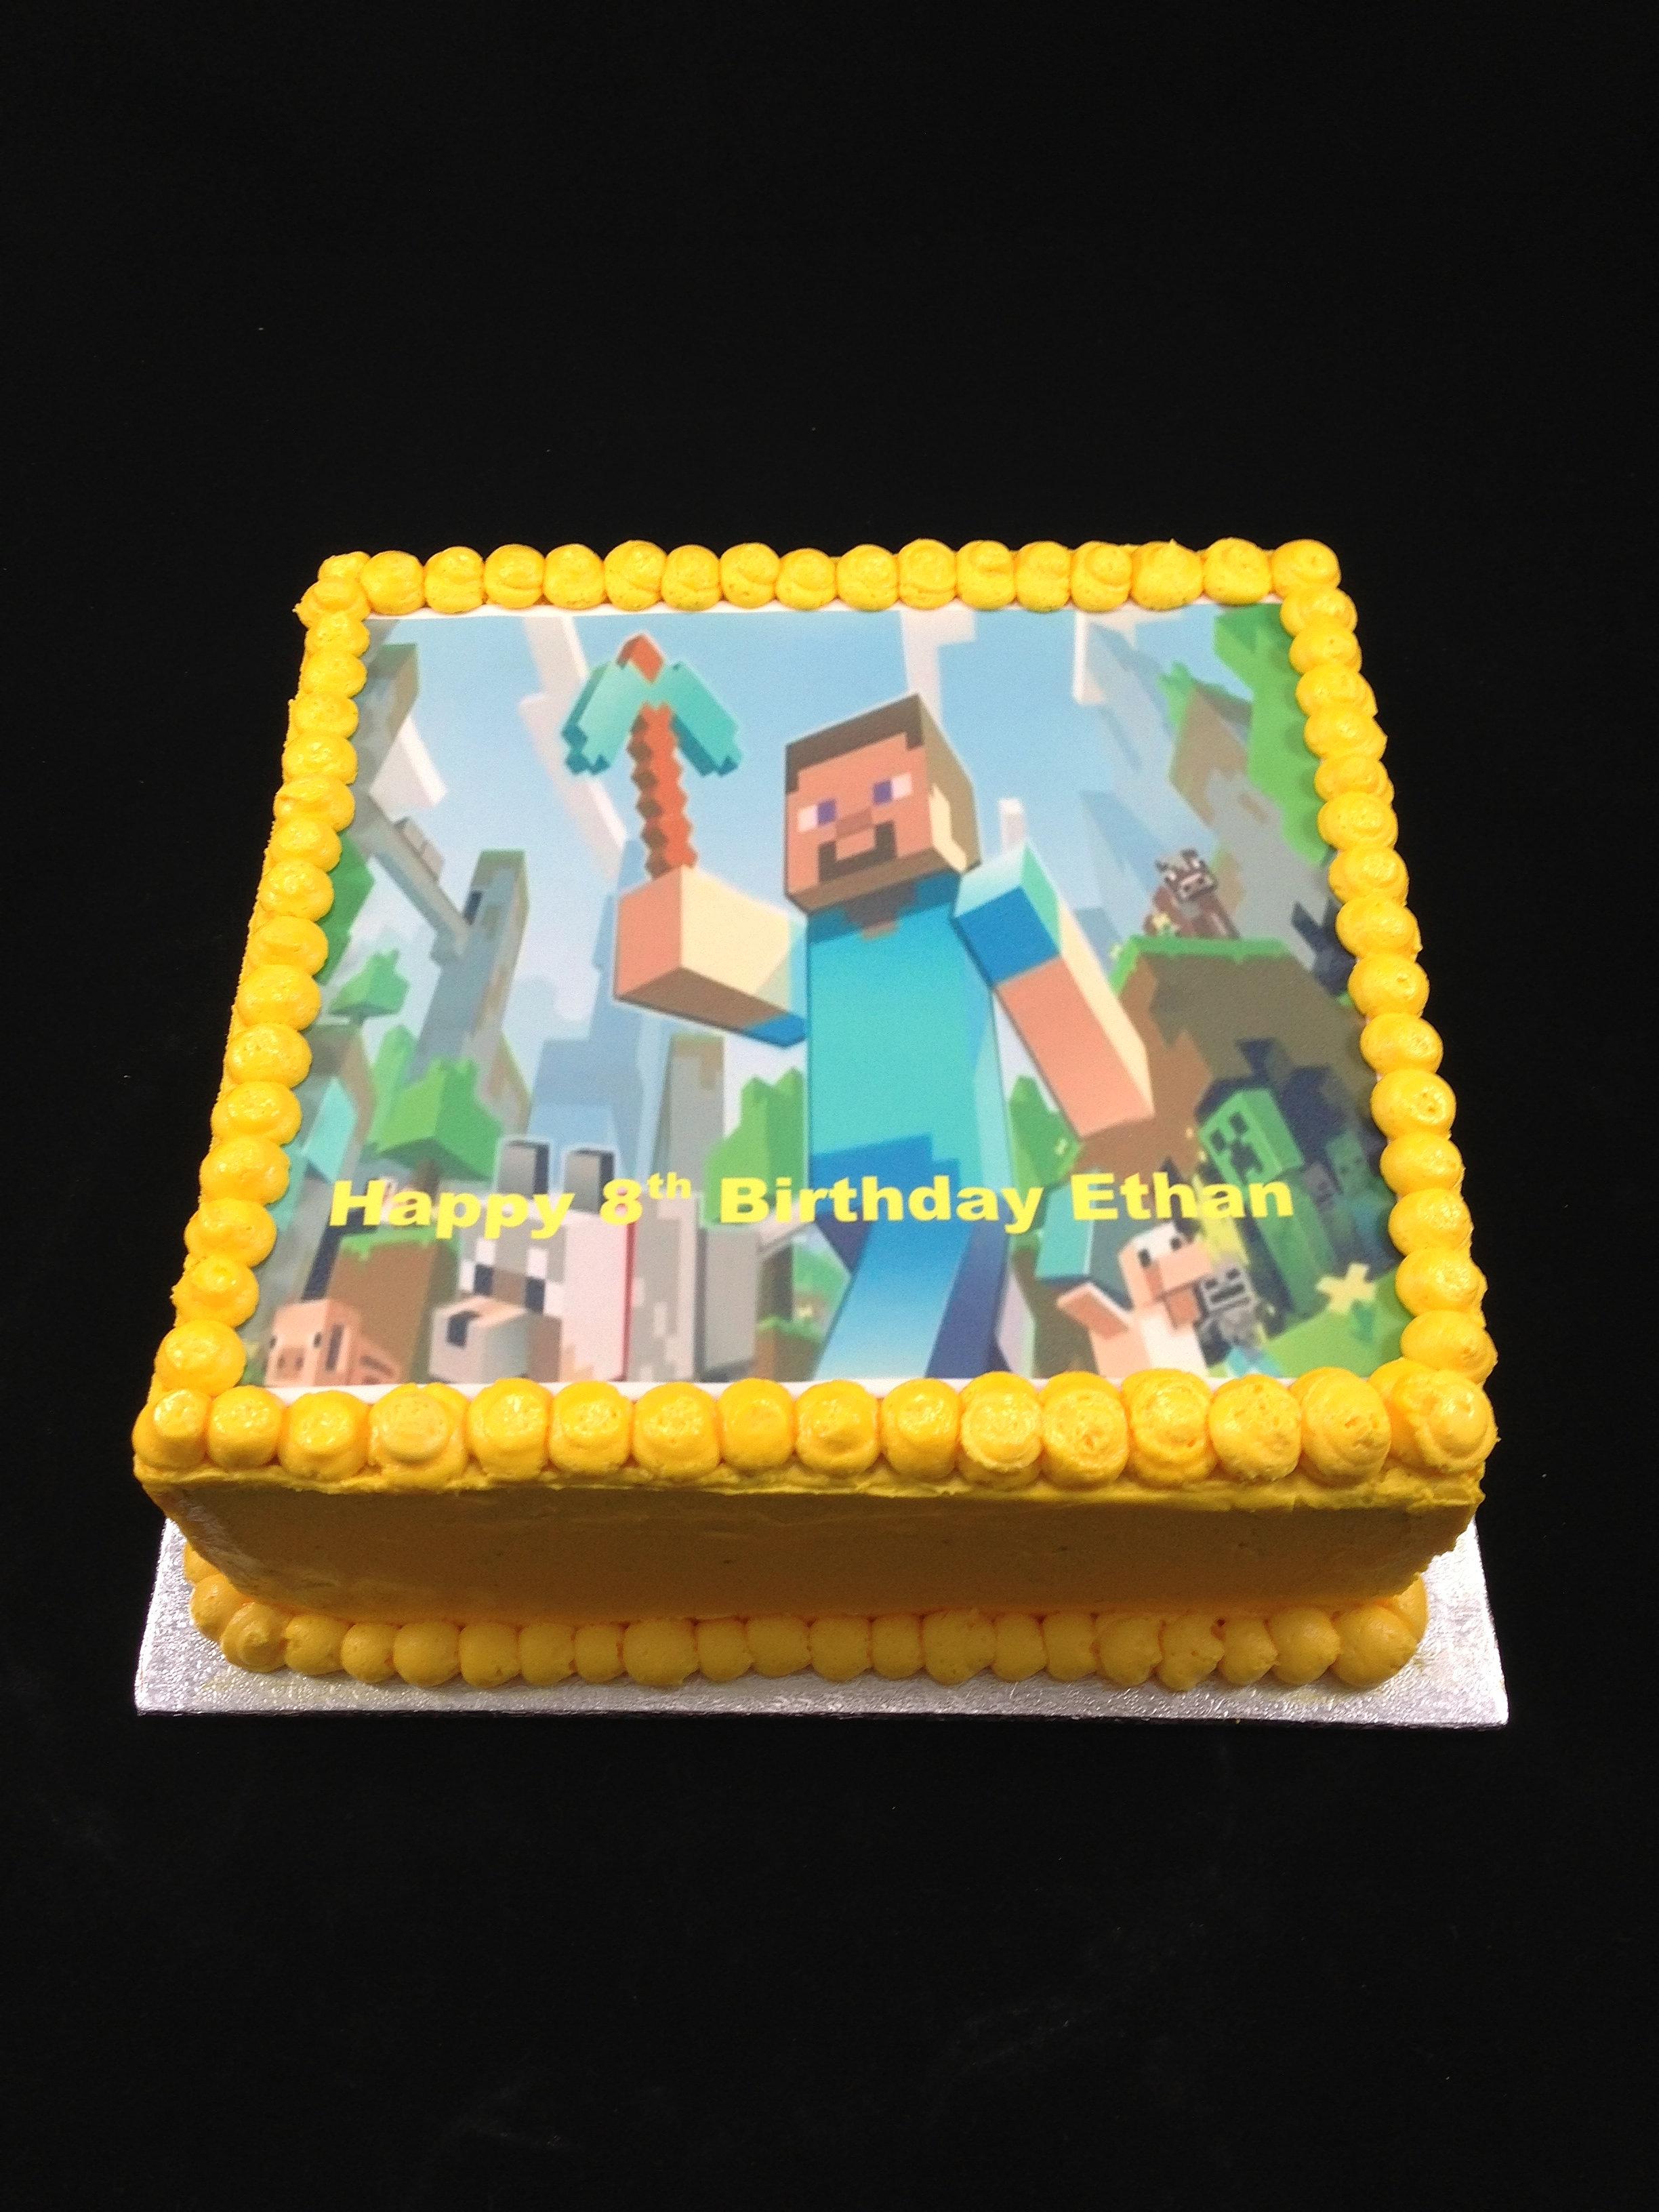 Decorating Ideas > Sensational Cakes Cake Decorating Classes Sydney  ~ 024119_Cake Decorating Ideas Minecraft